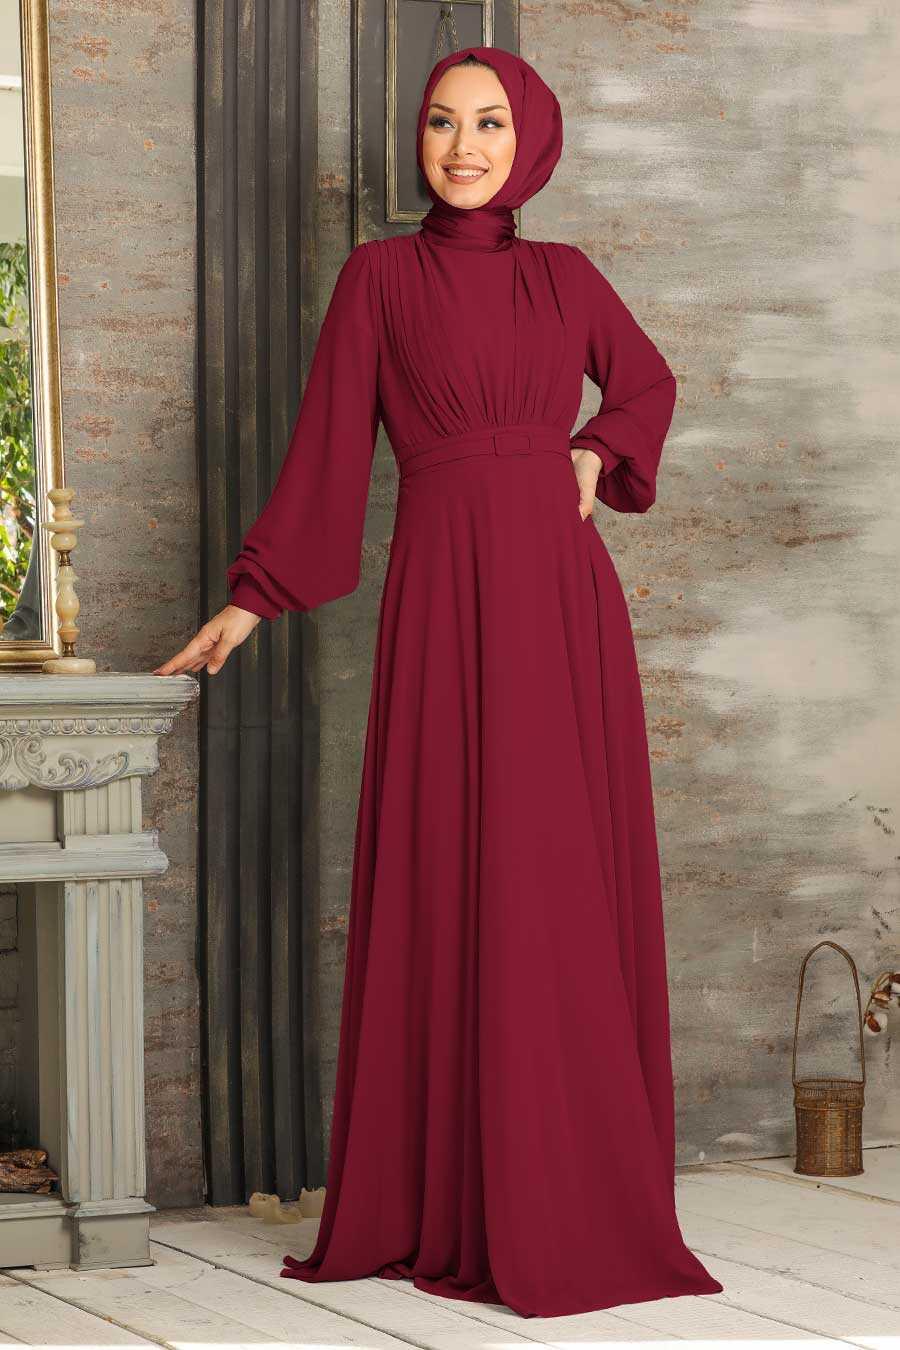 Claret Red Hijab Evening Dress 5422BR